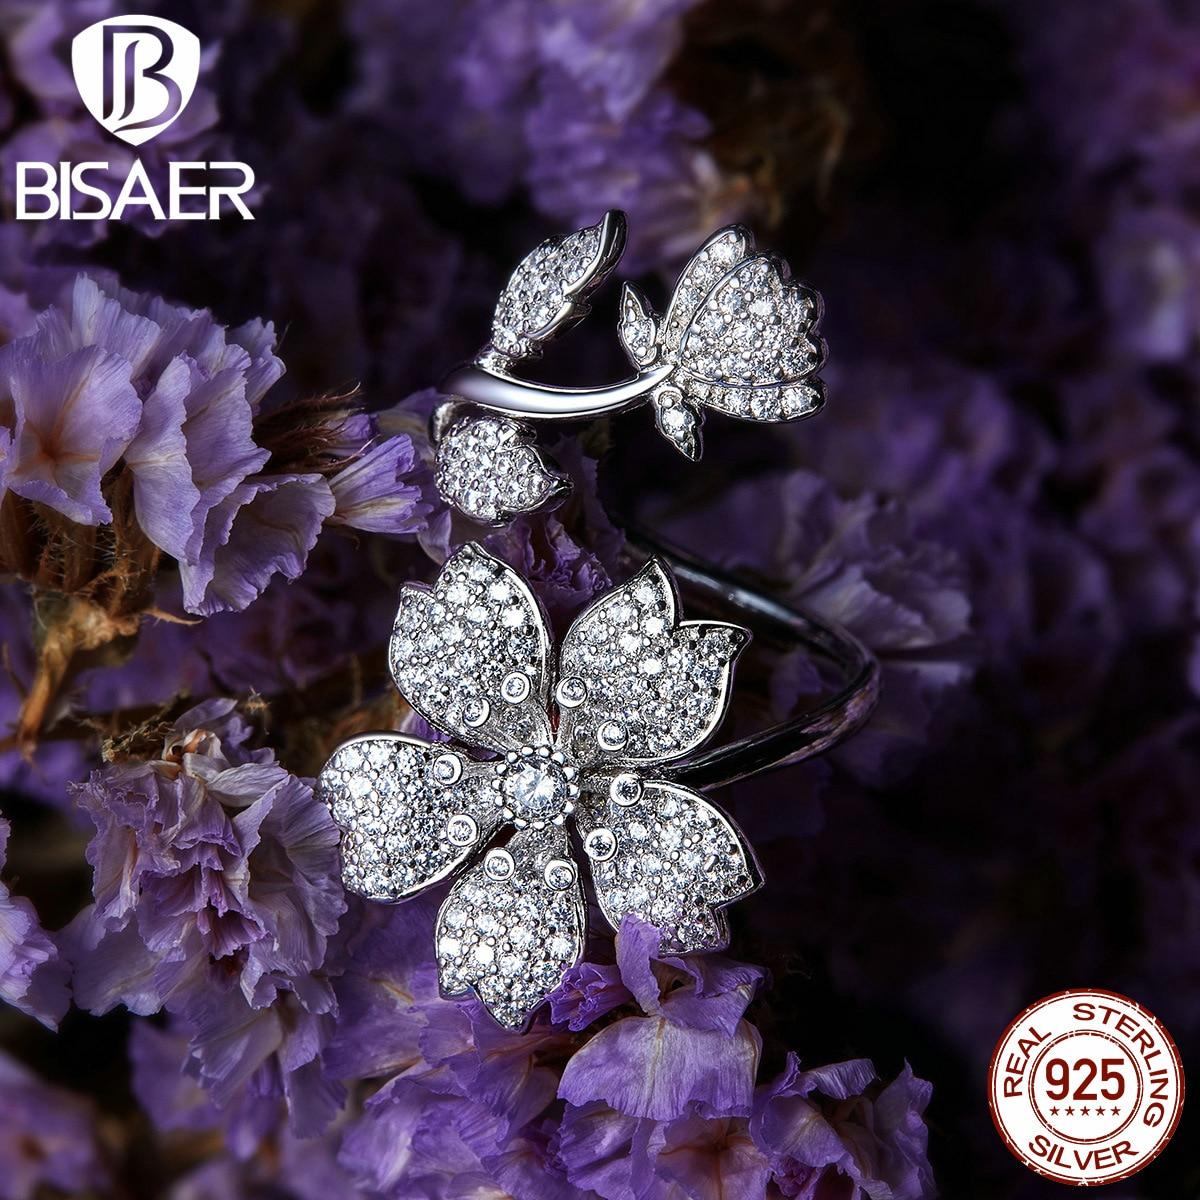 Sakura rings bisaer dazzling cubic zircon 925 Sterling silver blooming Sakura flowers finger rings for women jewelry EFR076